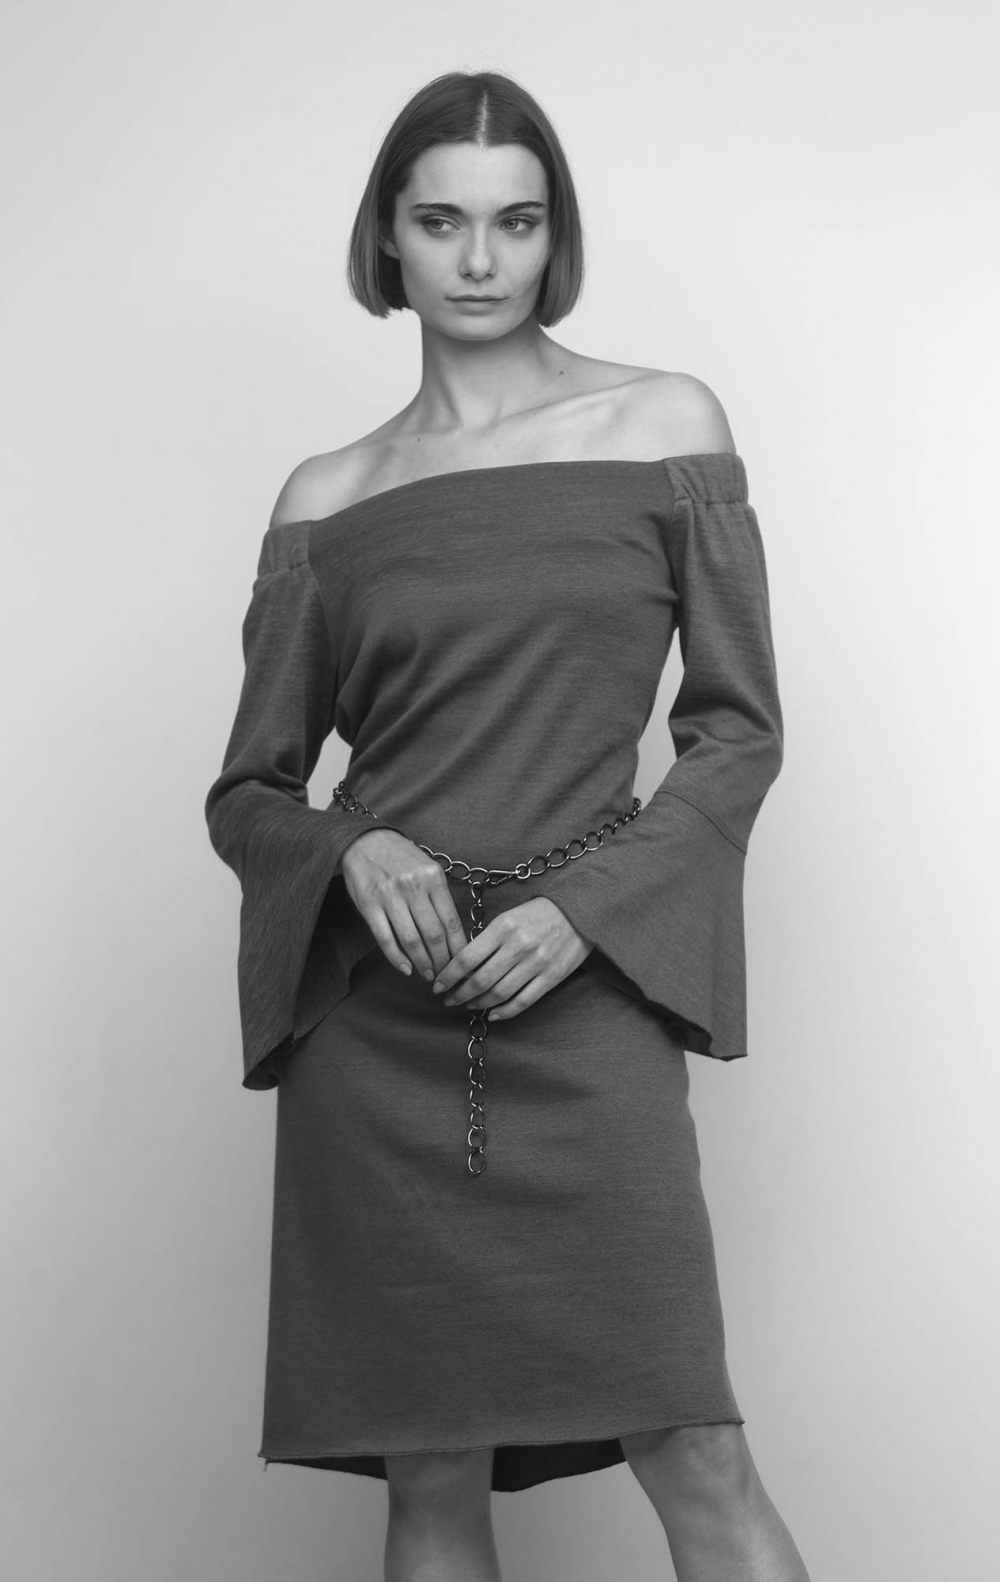 Vestido Cinza Ombro a Ombro Malha - Foto 1